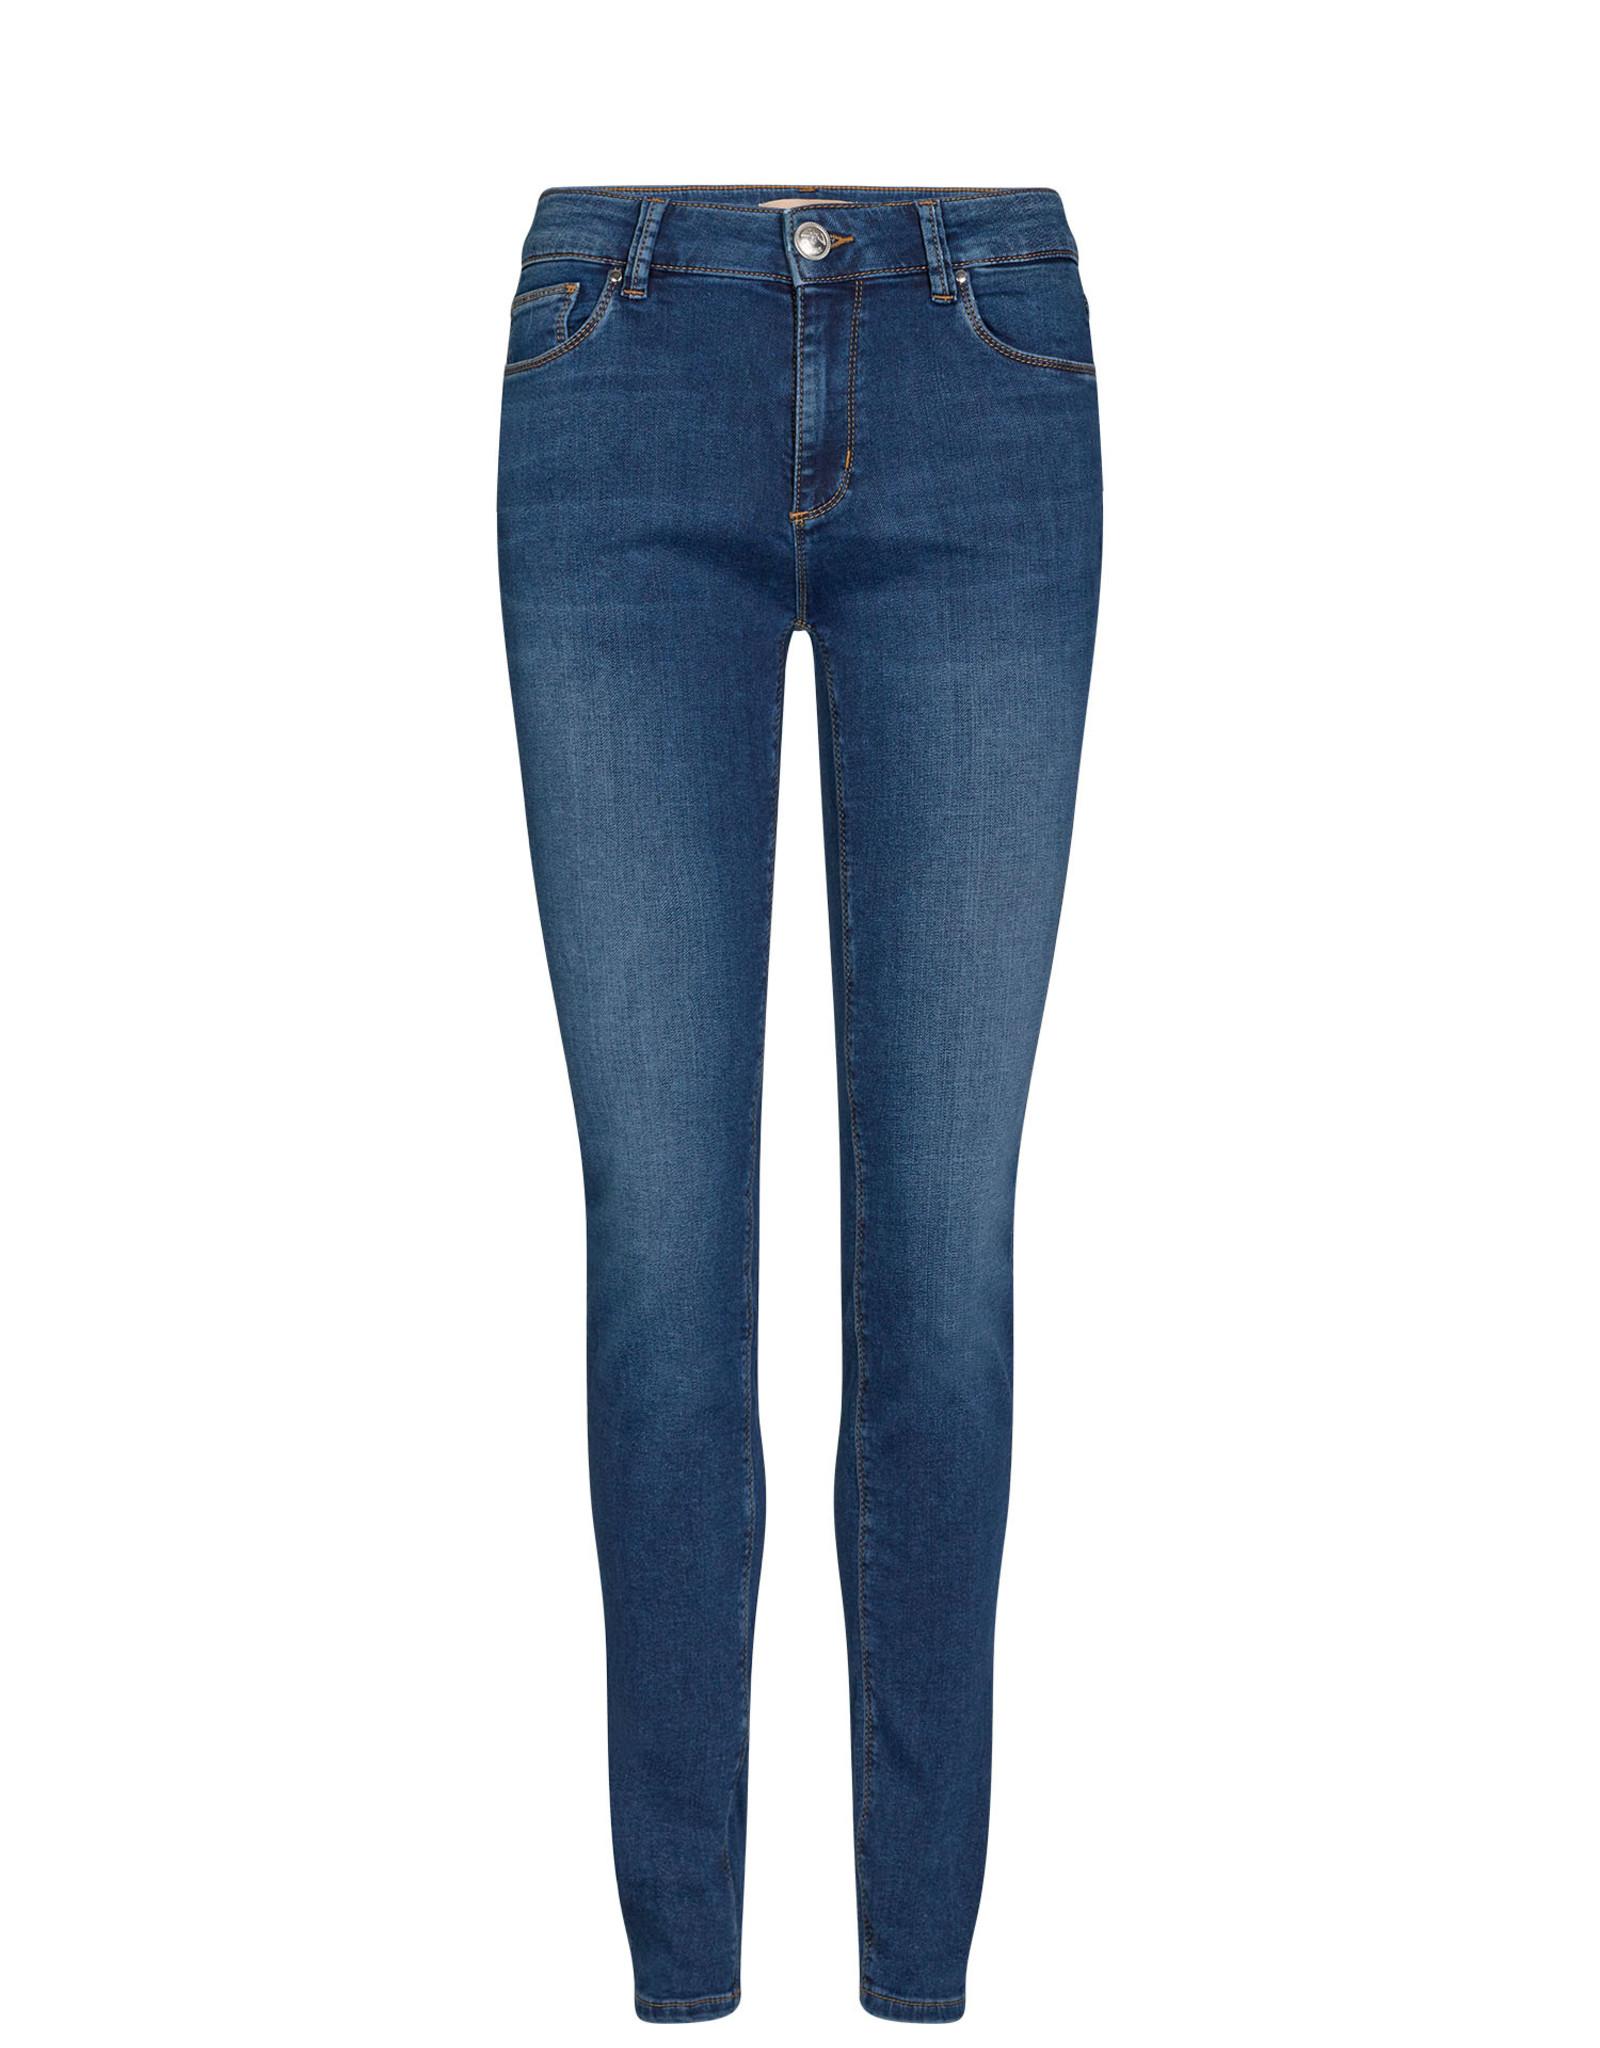 Mos Mosh Jade Cosy Jeans - 141040